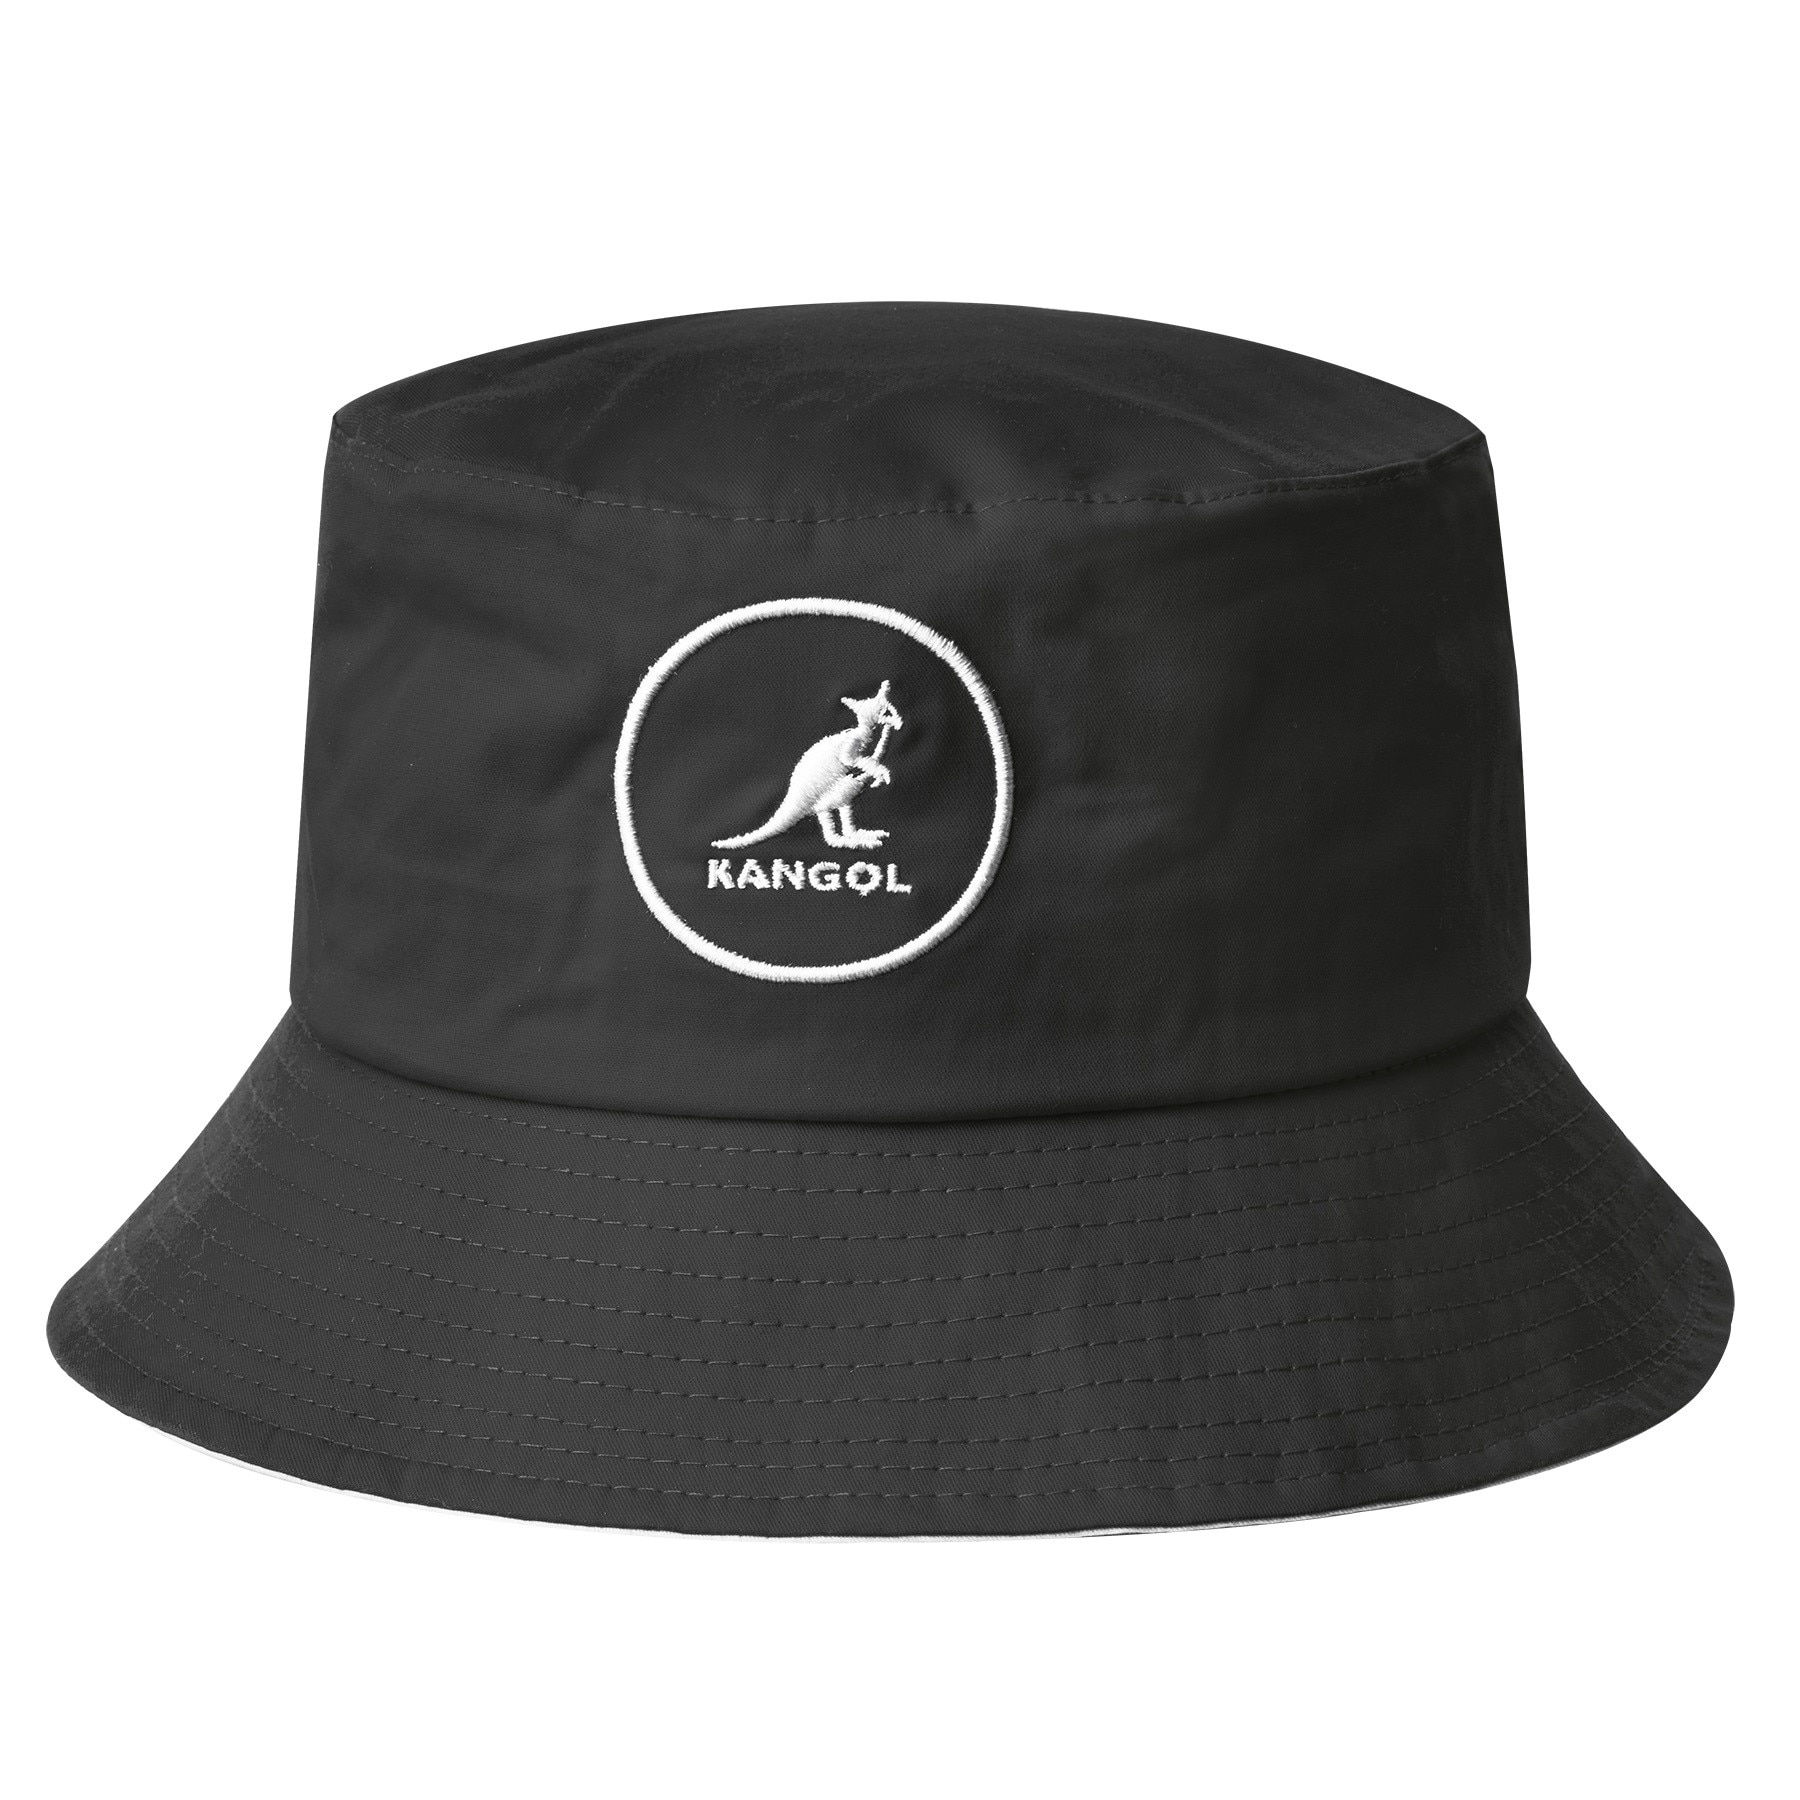 cel mai bun pret reducere proaspăt confortabil Palarie neagra Kangol Cotton Bucket - L - eMAG.ro